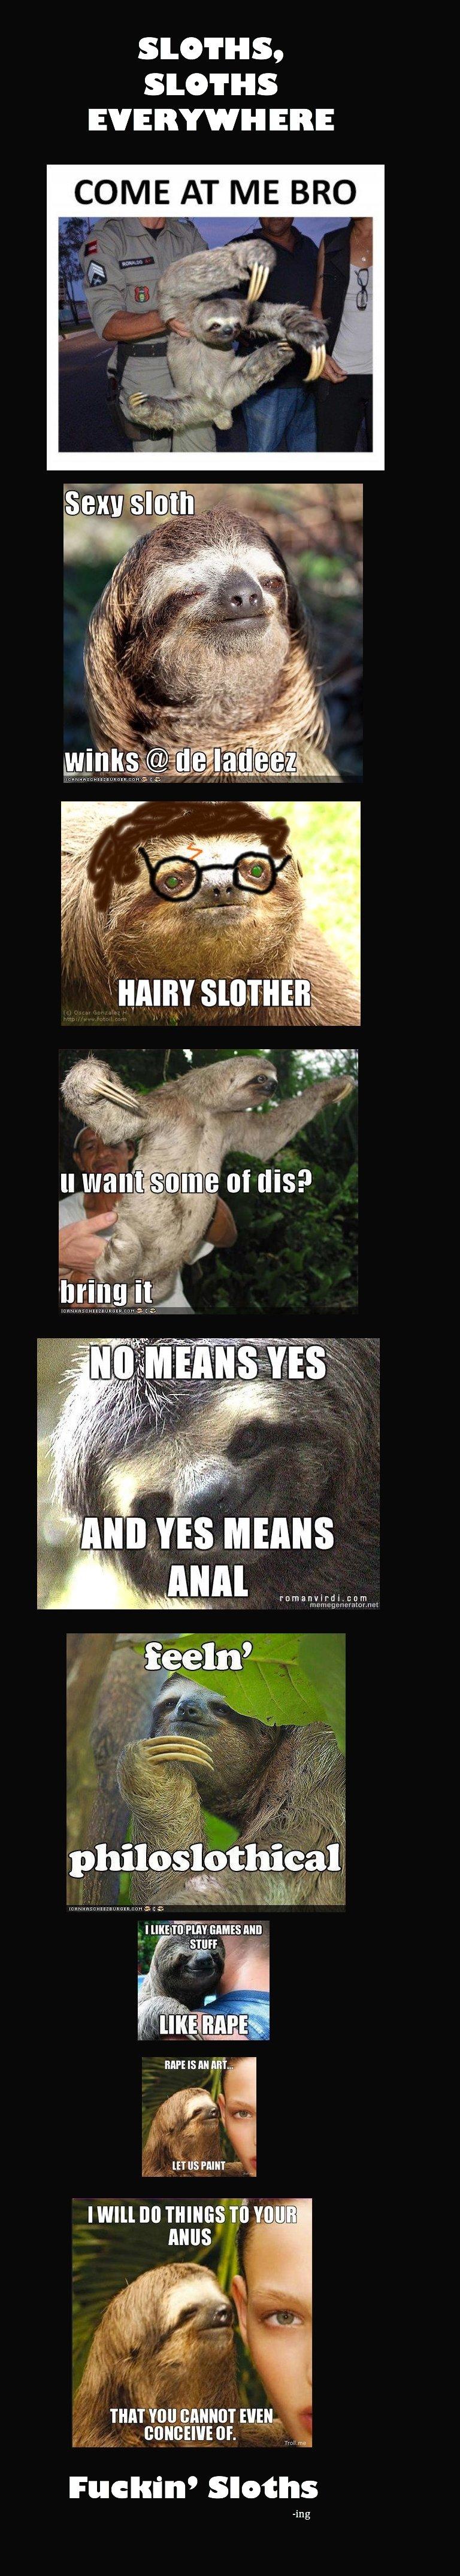 Sloths.. THEY DERK AR DURRR. dickbutt dedz to pheel. Elli COME AT ME BRO I WE P FUN cums Mo RAPE IS an Mi... manna! mm no mimitw mu ANUS THAT VIII] NEIL, Sleuth derp